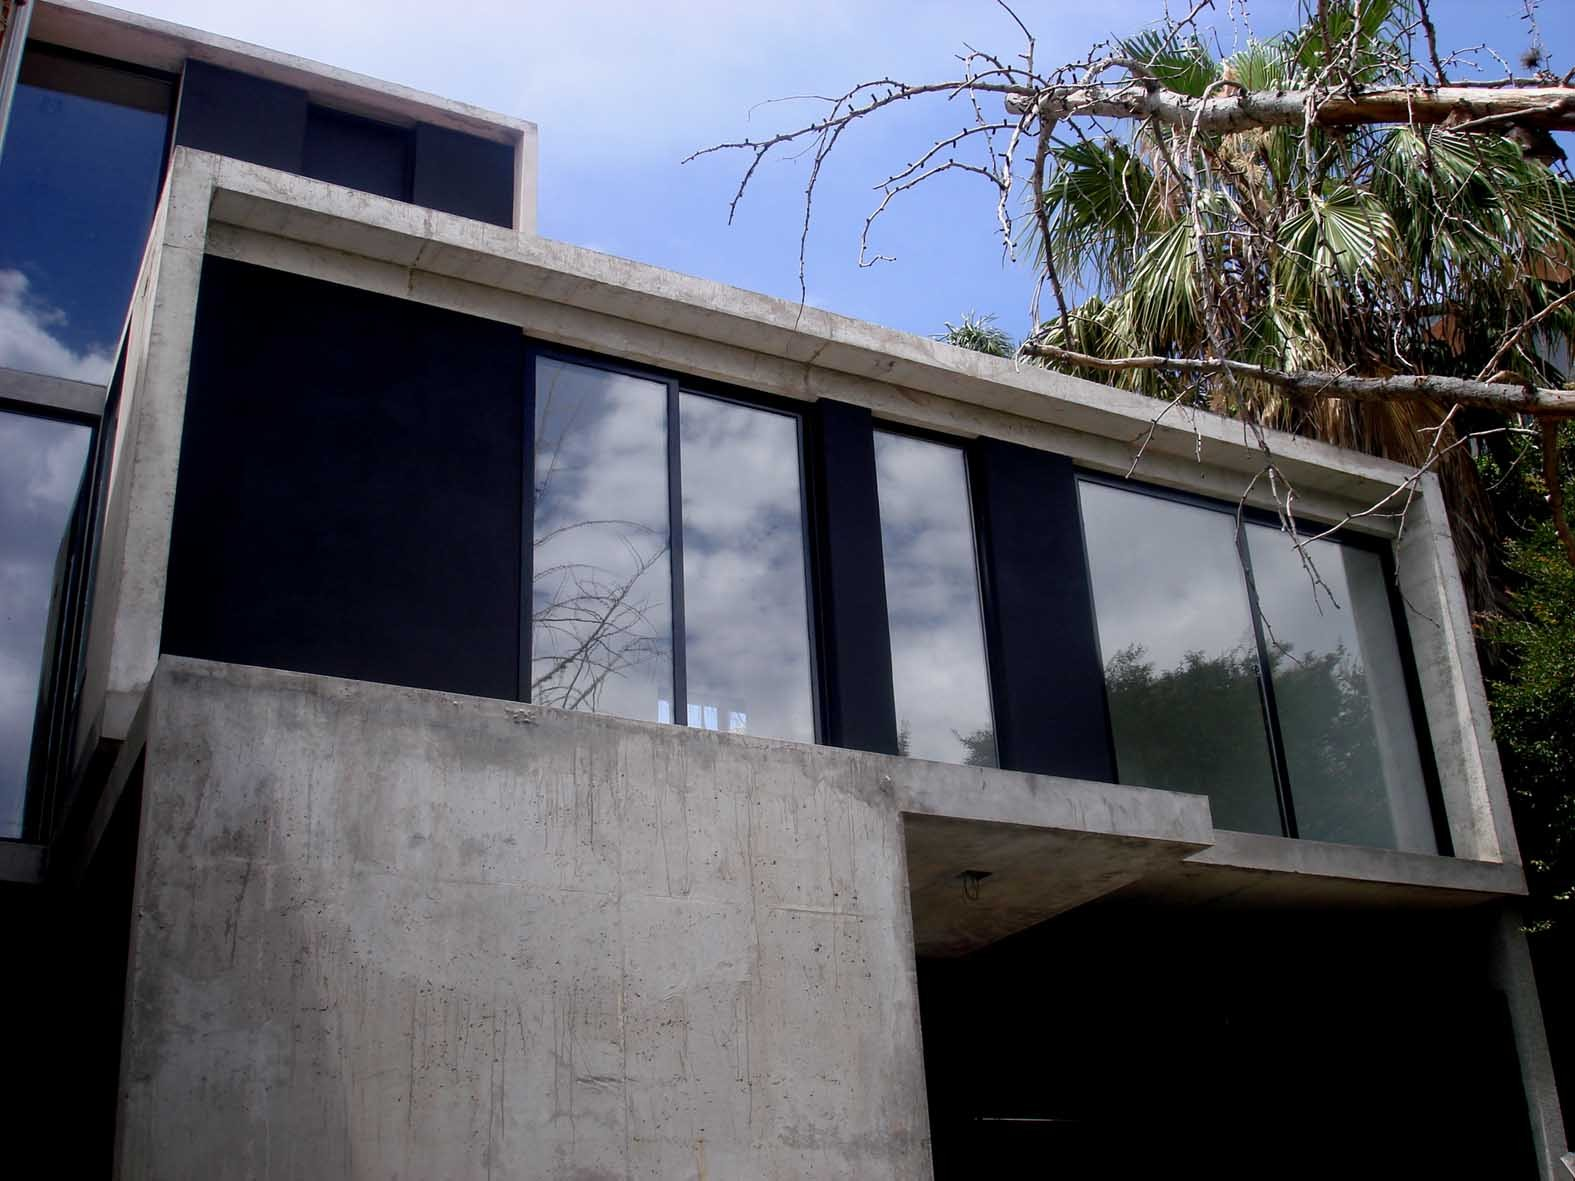 Galer a de casa marielitas estudio dayan arquitectos 1 - Estudio 3 arquitectos ...